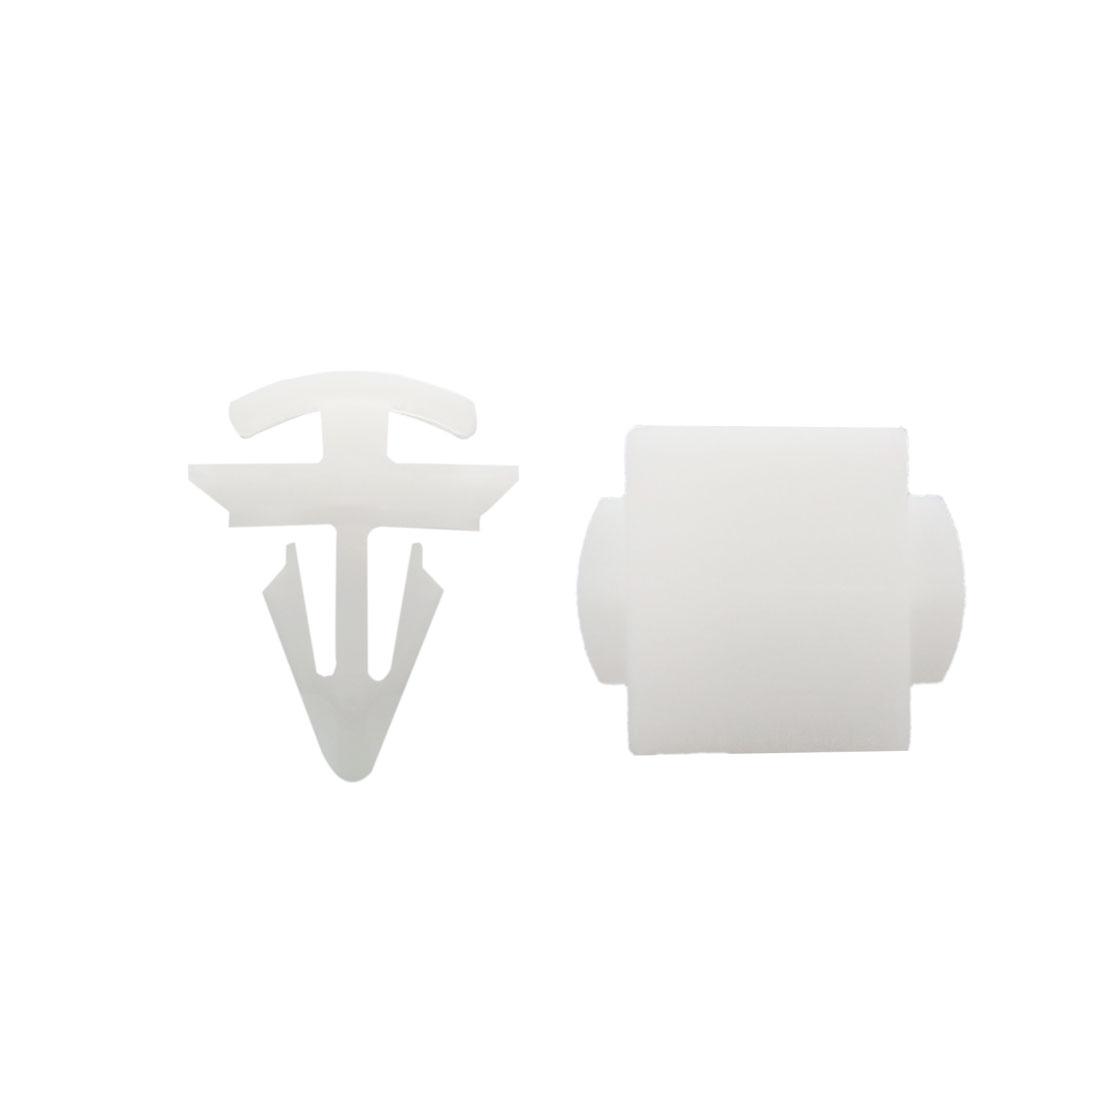 40 Pcs White 9.5mm Dia Hole Plastic Push-Type Rivet Clips for Automobile